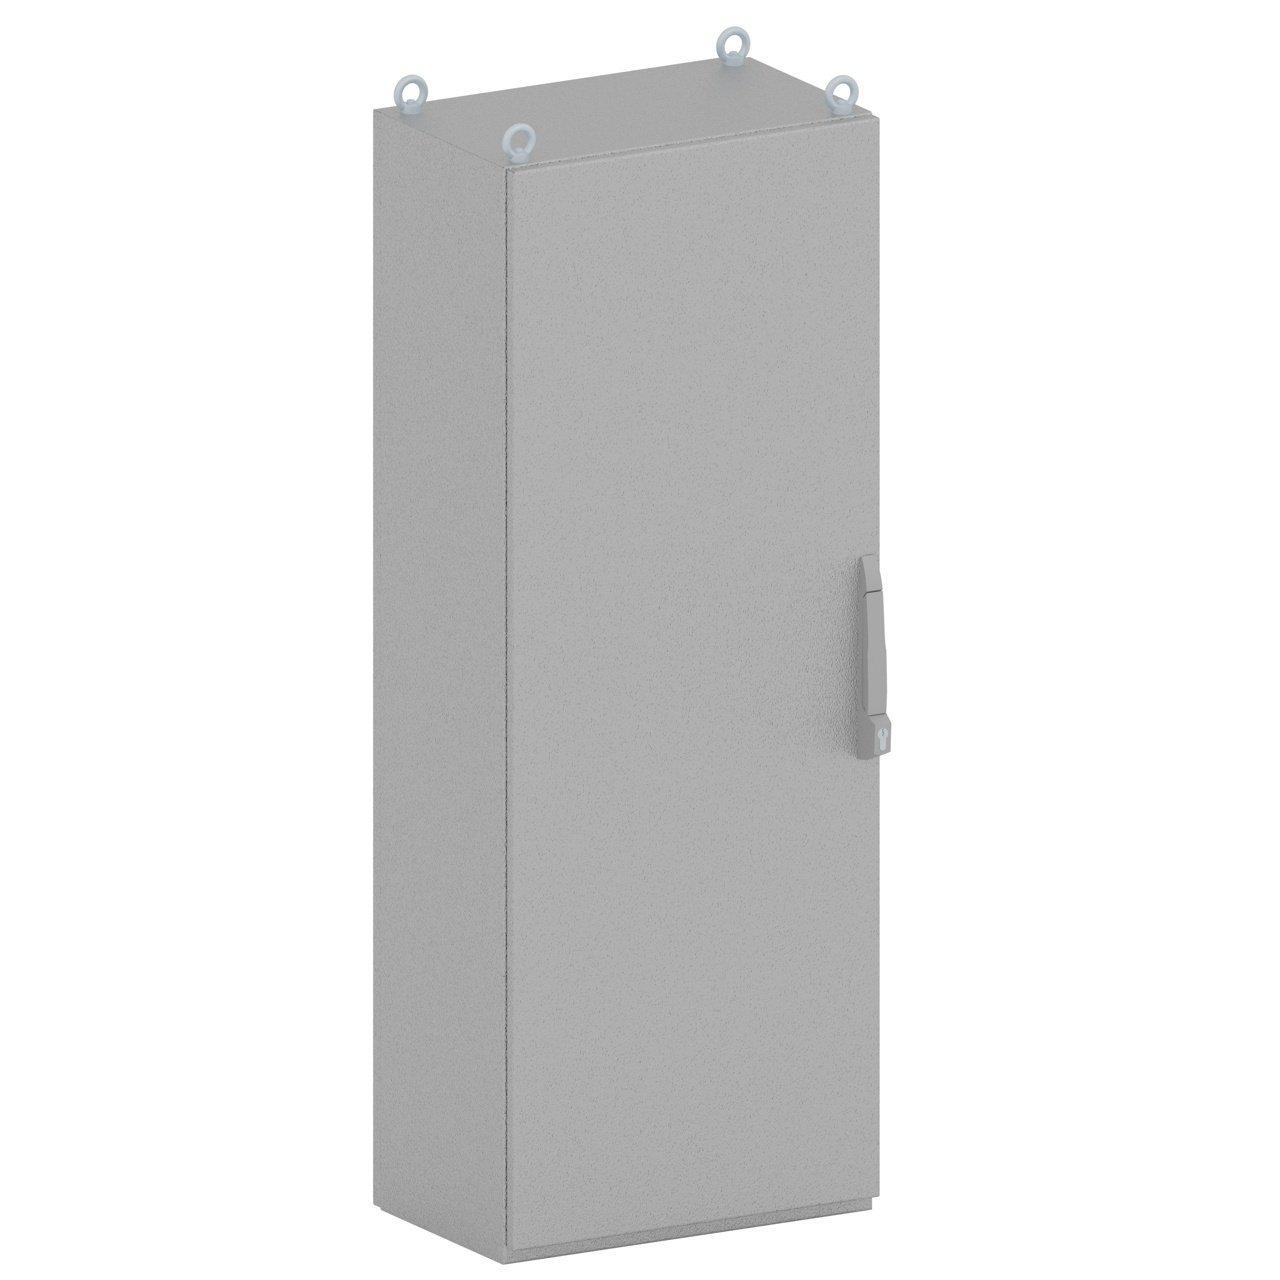 KAPPA eintürig | 2200x600x100 mm